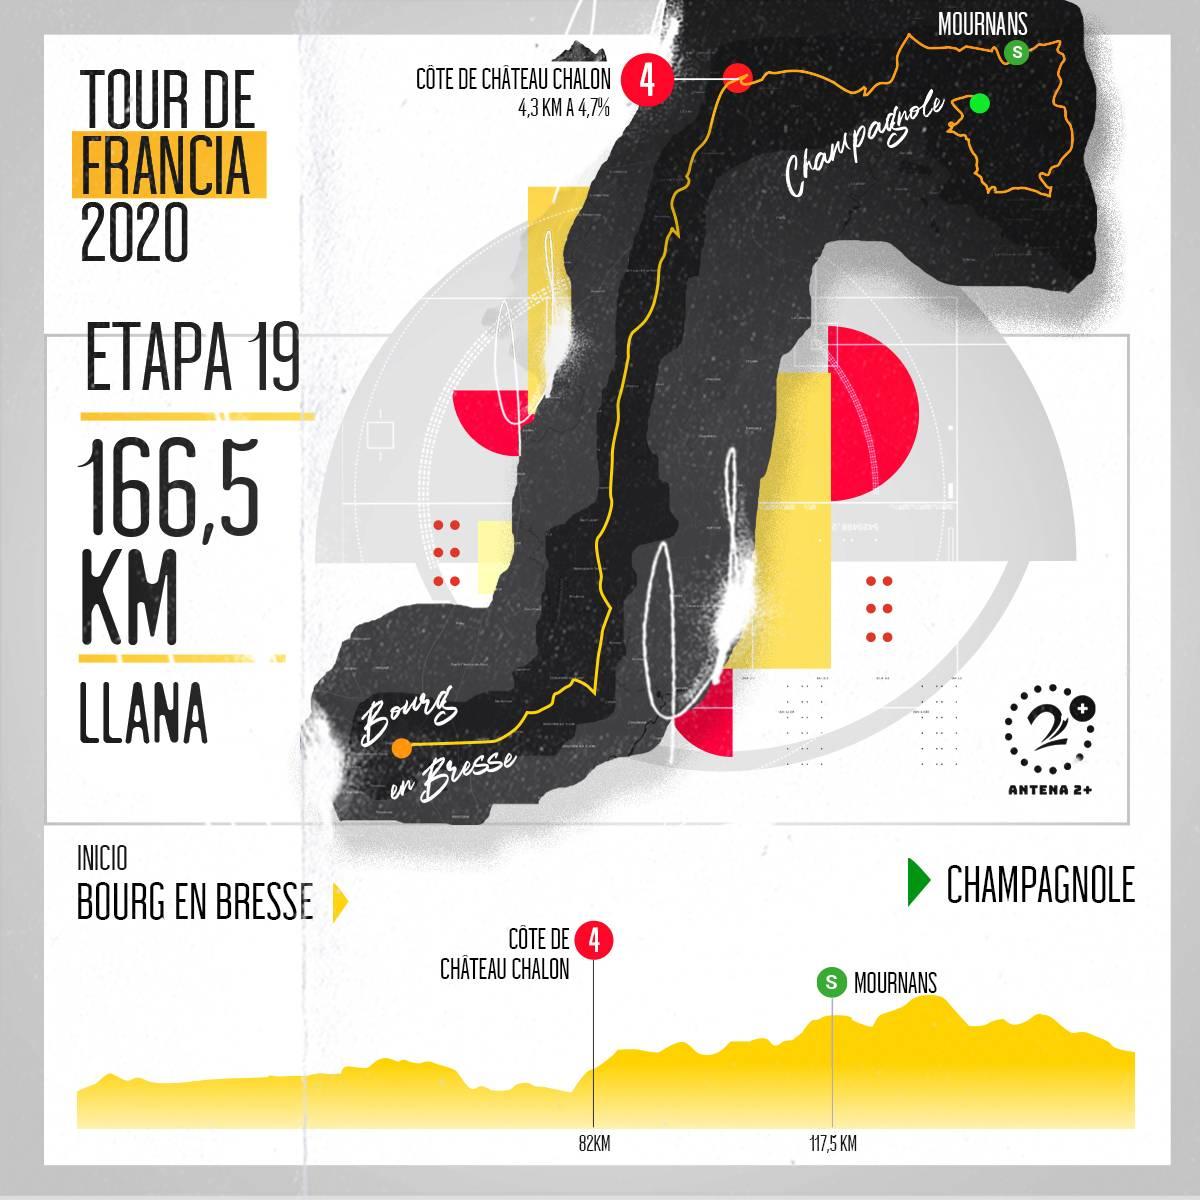 Tour de Francia, altimetrías: Bourg-en-Bresse - Champagnole, 166 kilómetros, etapa 19